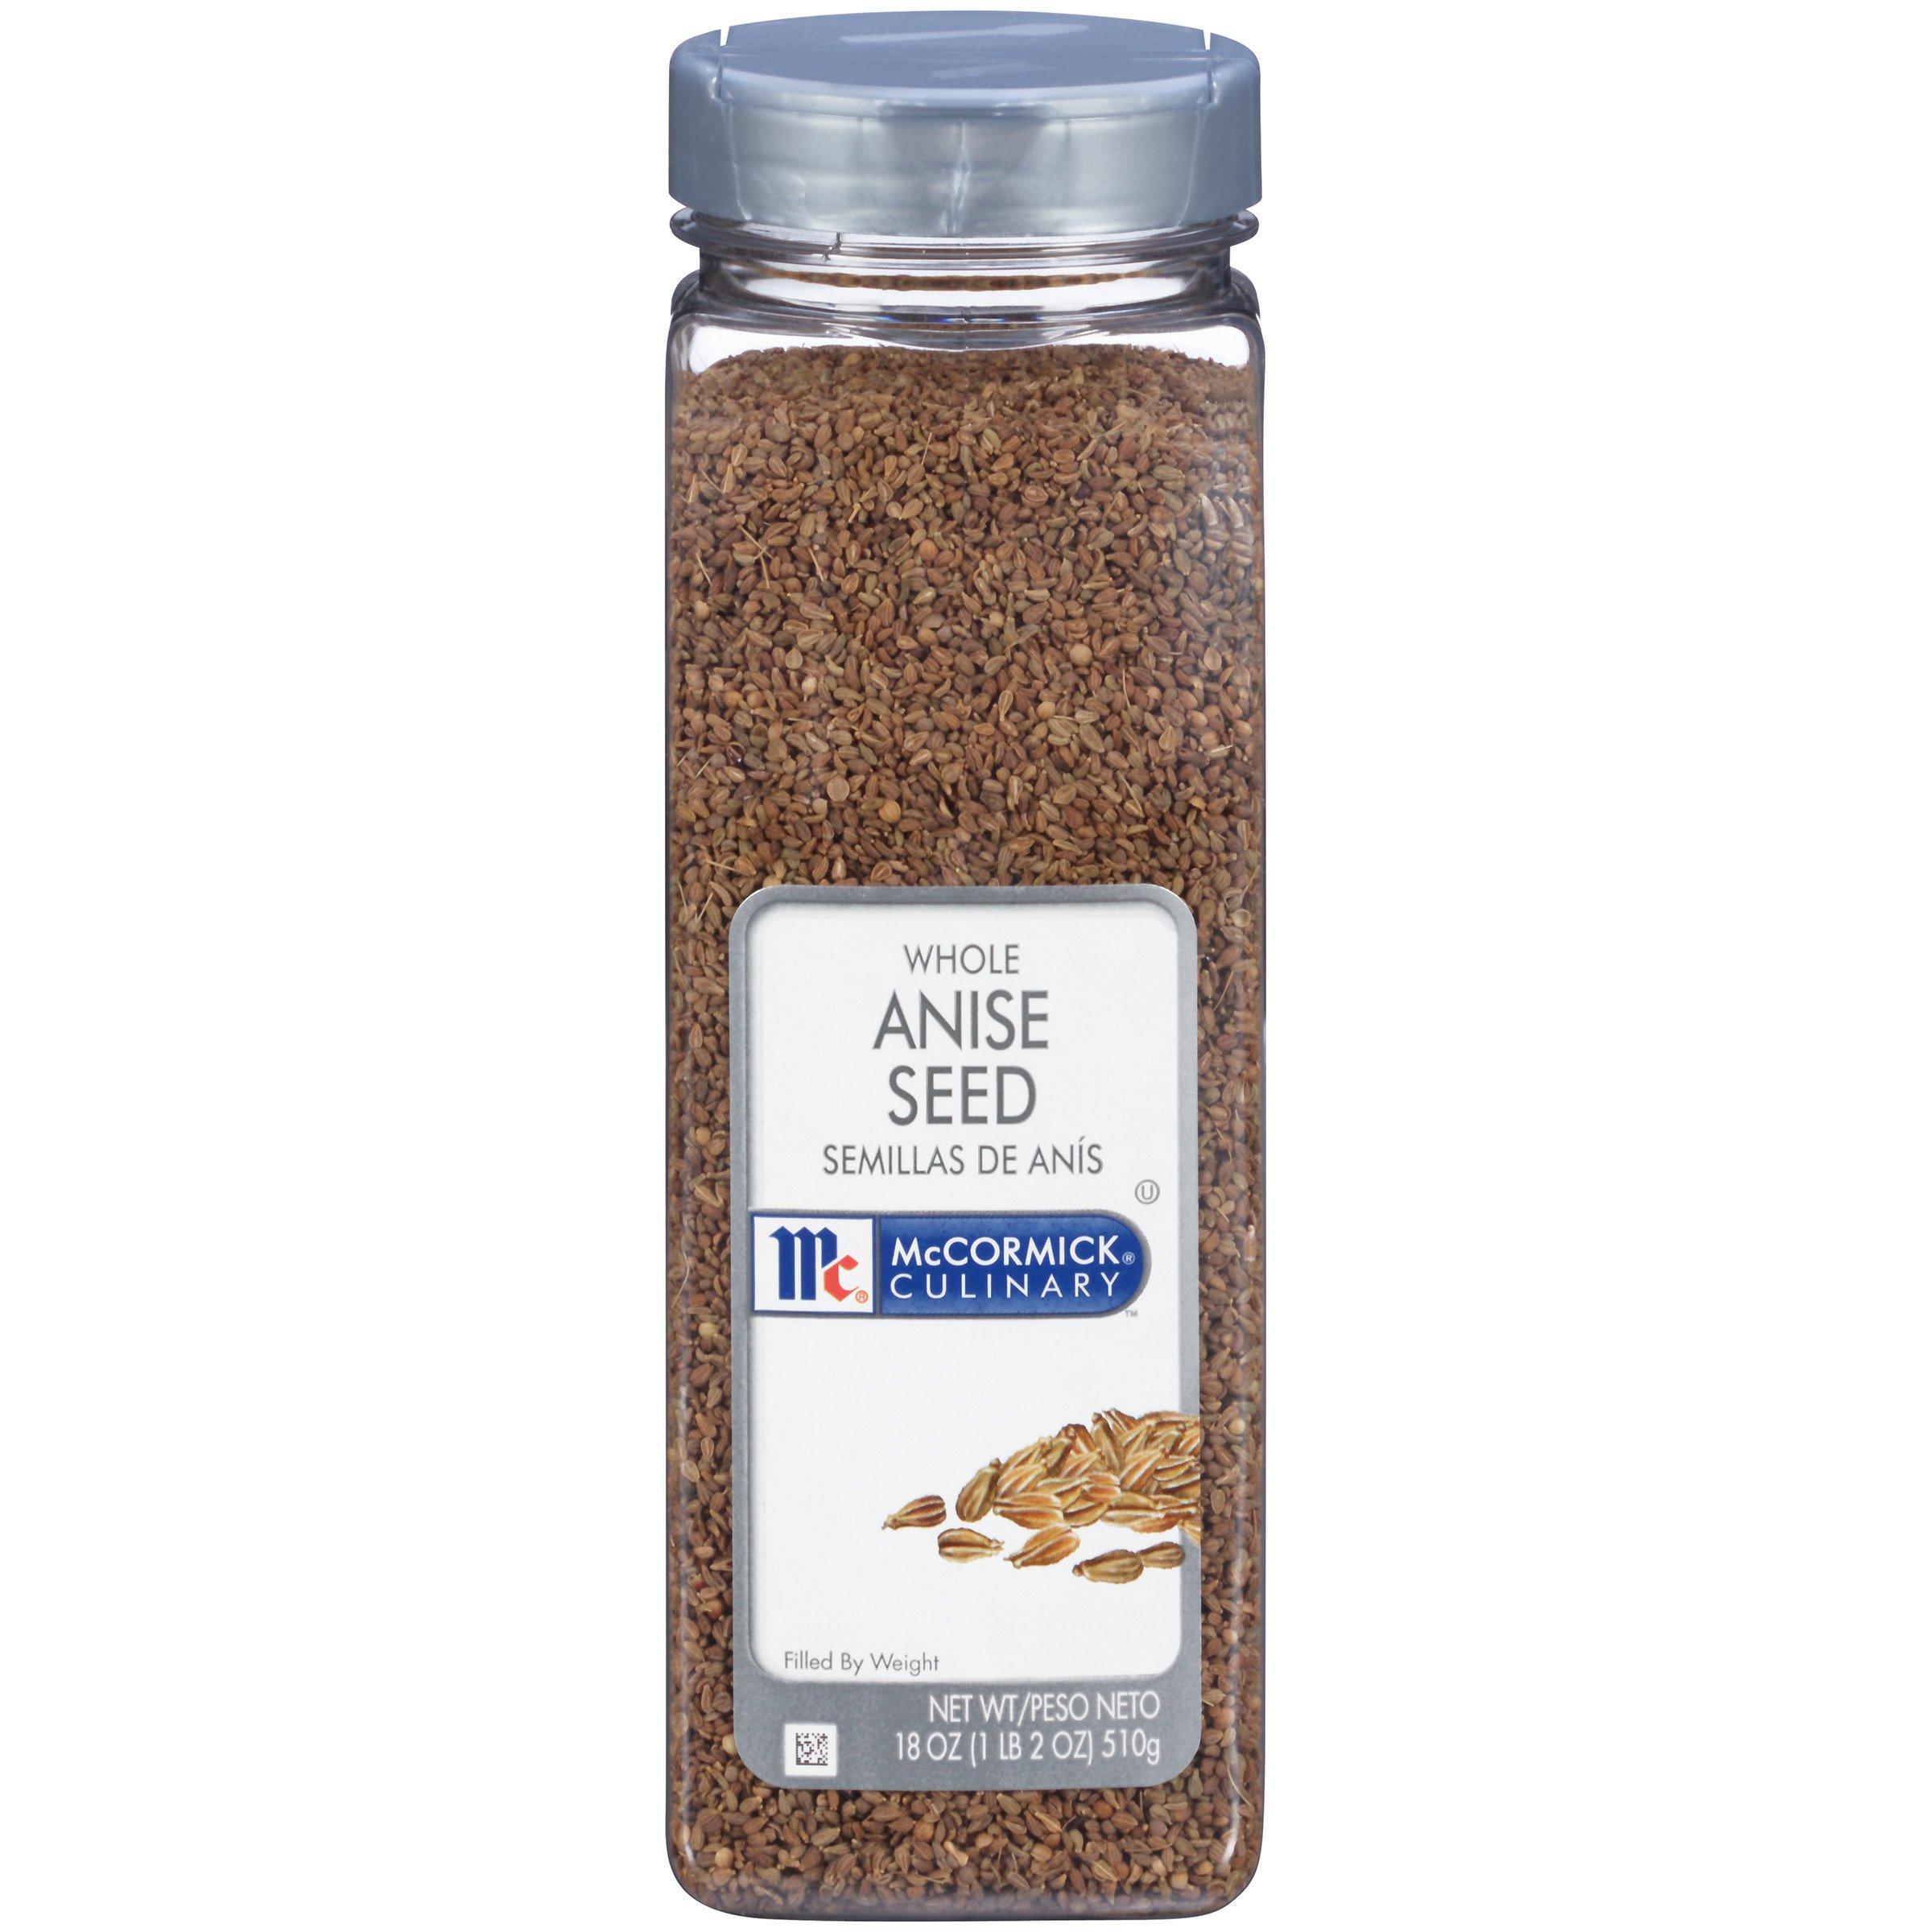 McCormick Culinary Whole Anise Seed, 18 oz